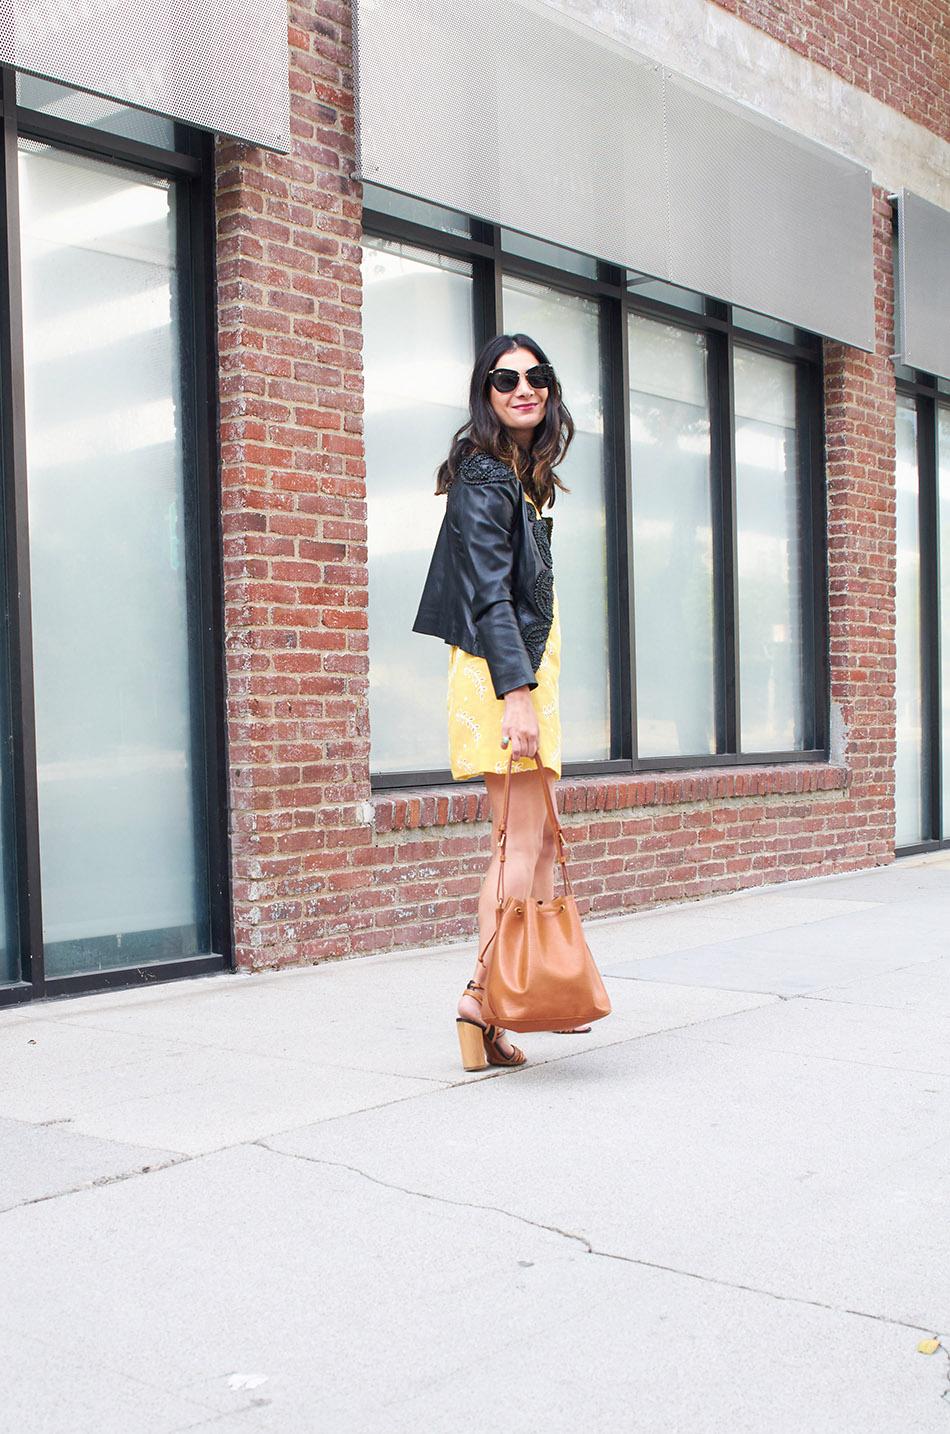 how to style trendy leather jackets www.avintagesplendor.com